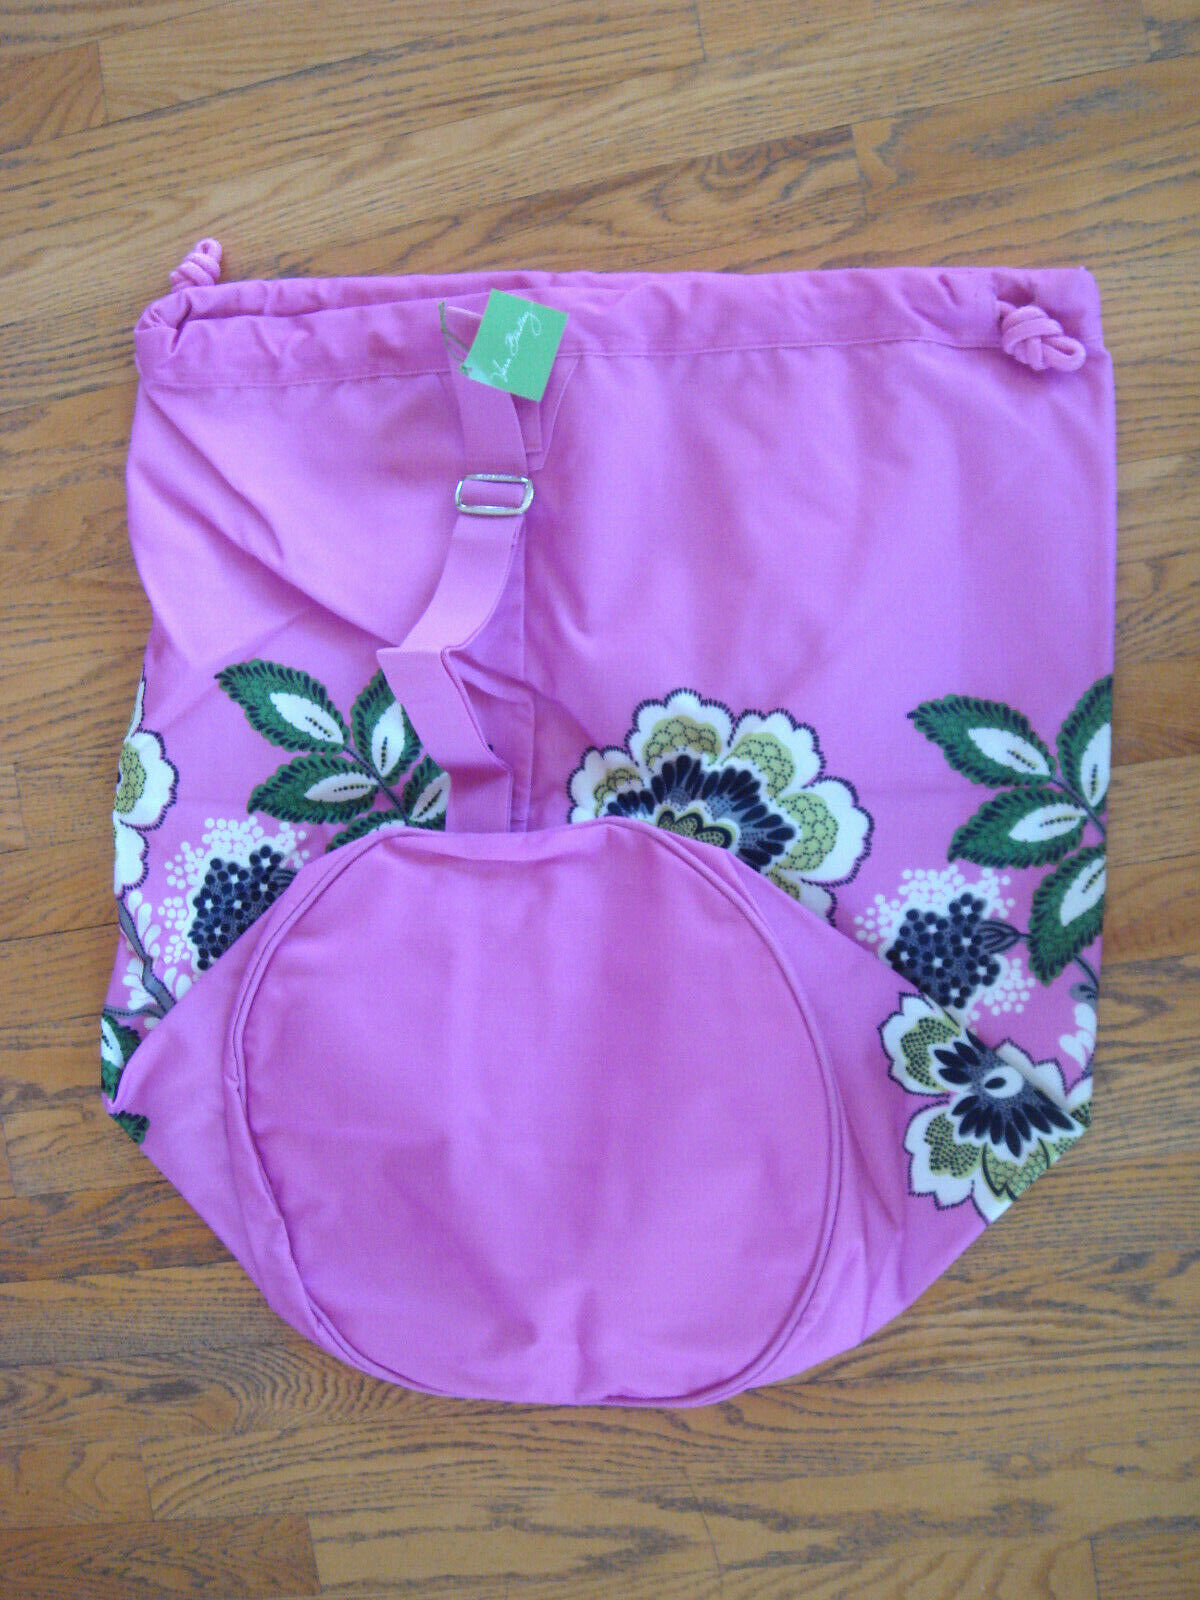 "NWT VERA BRADLEY Priscilla Pink Large Laundry Bag $49 27"" x"